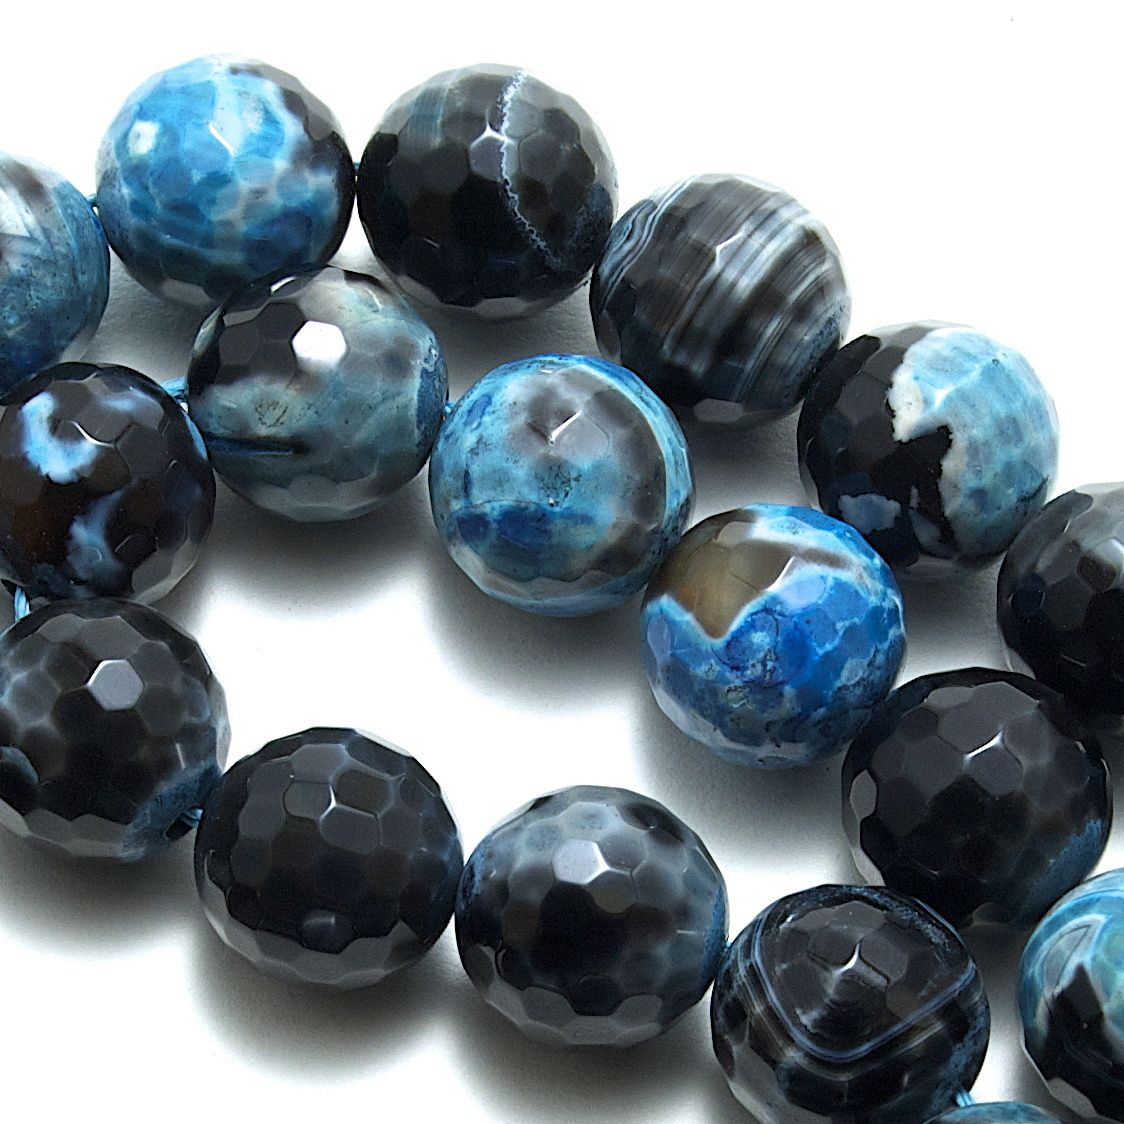 Agate & Aventurine Beads